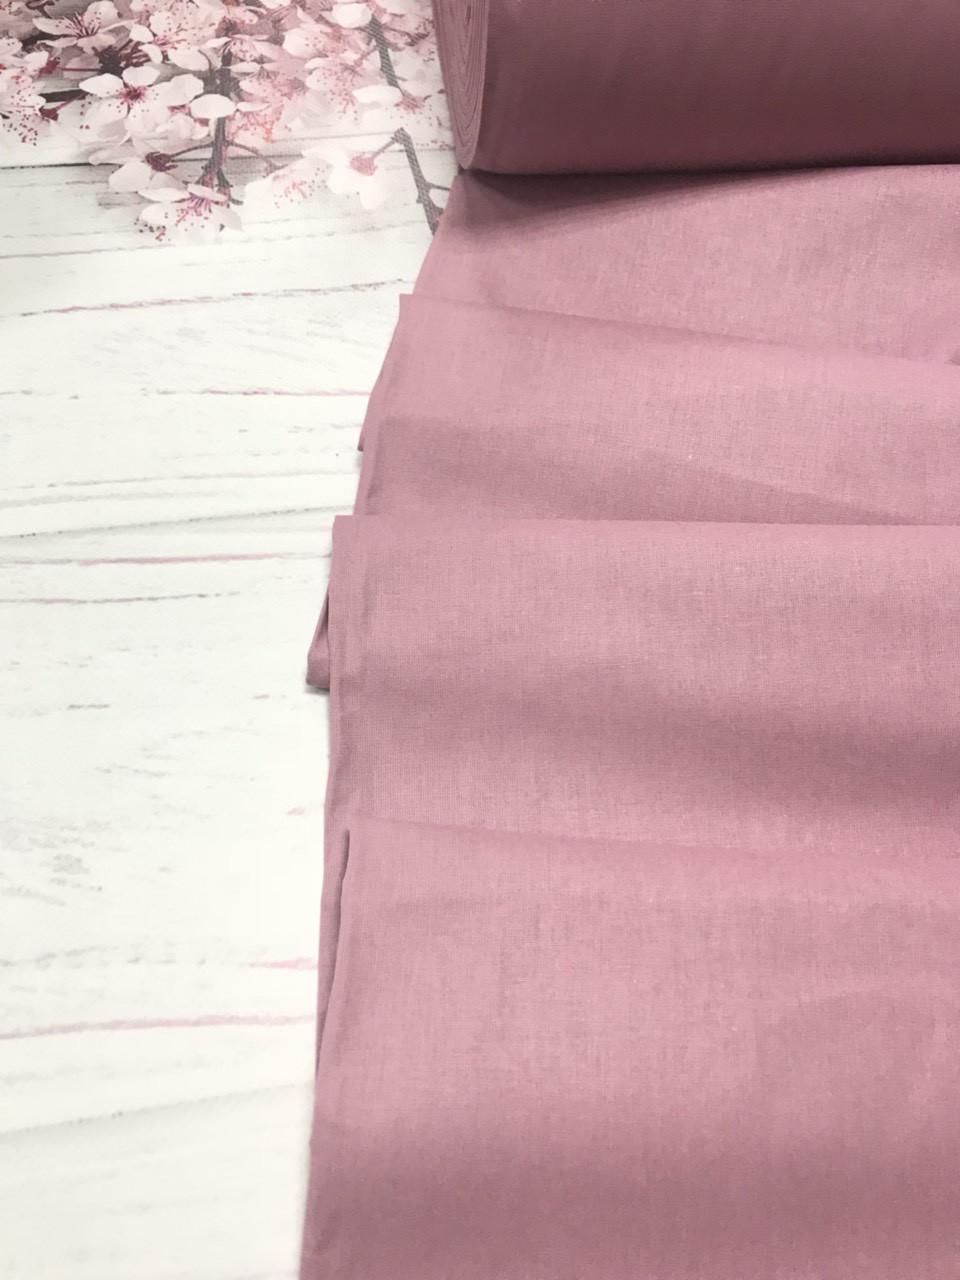 Ткань поплин De Luxe, однотонный темно-пудровый (Турция шир. 2,4 м) №32-41b ОТРЕЗ (0.95*2.4)